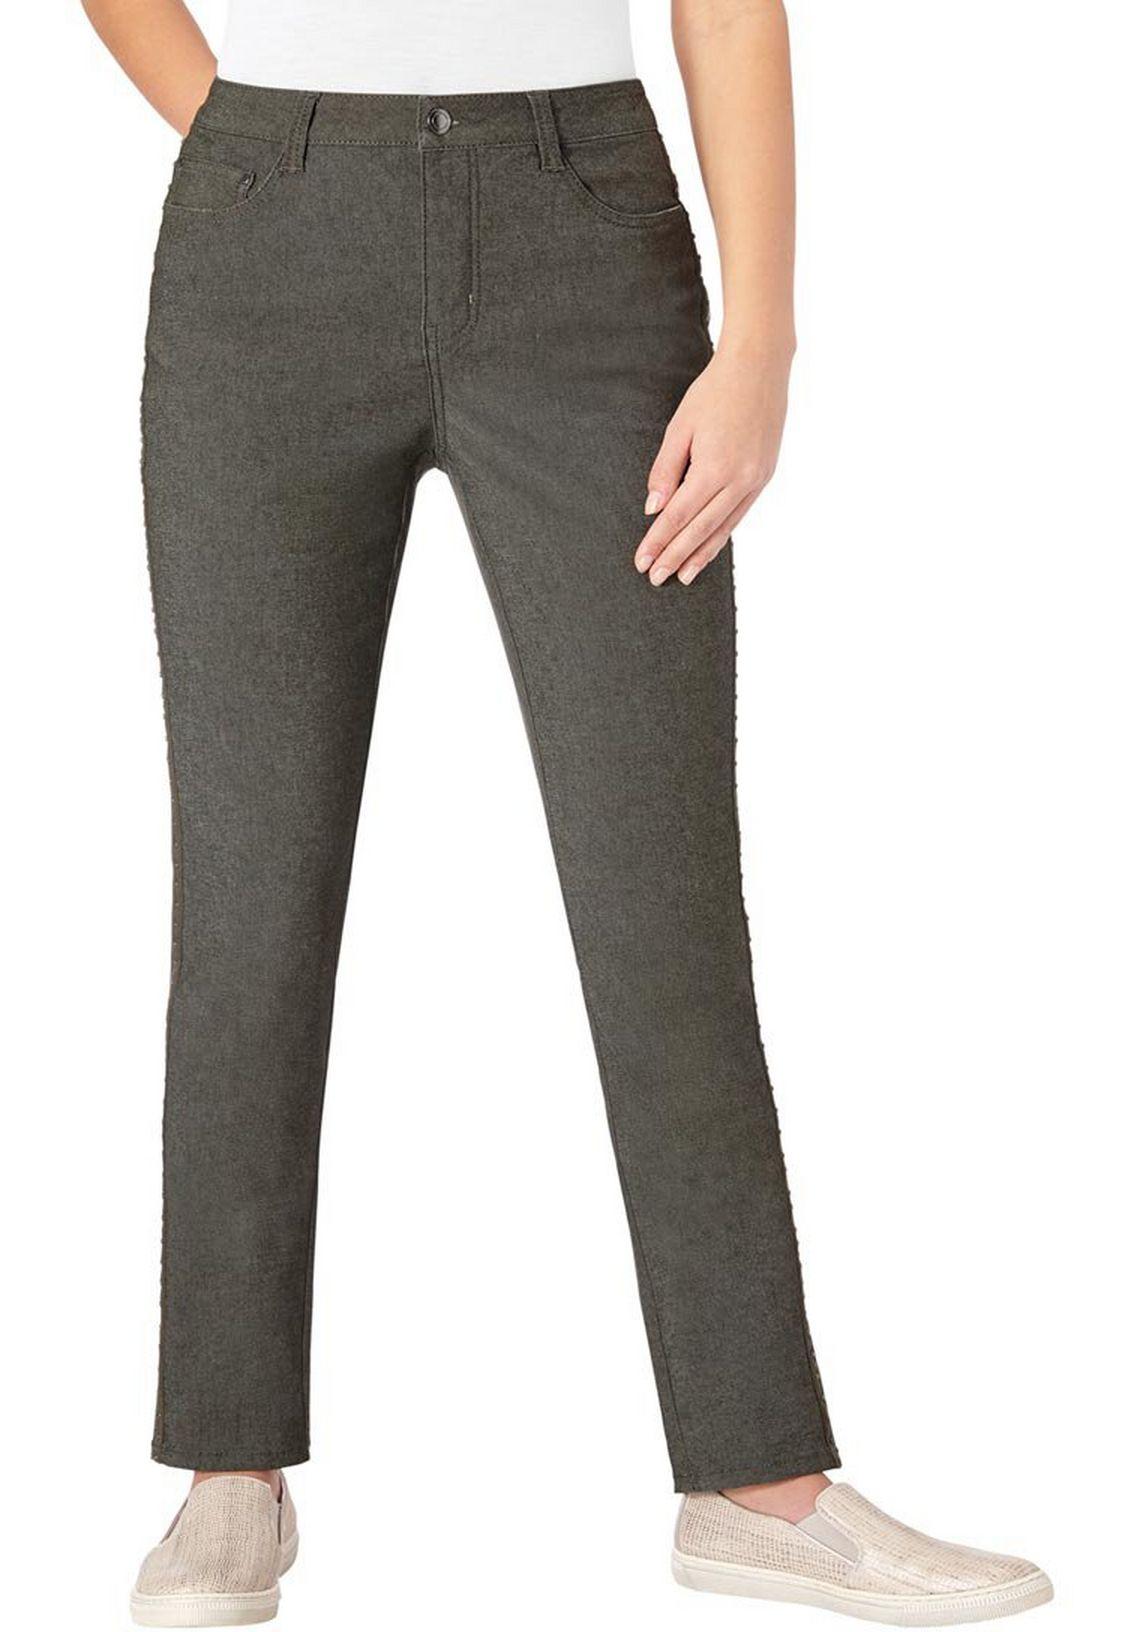 Classic Inspirationen Jeans In Populair Five-pocketsmodel Vind Je Bij Kaki QjmTt06A